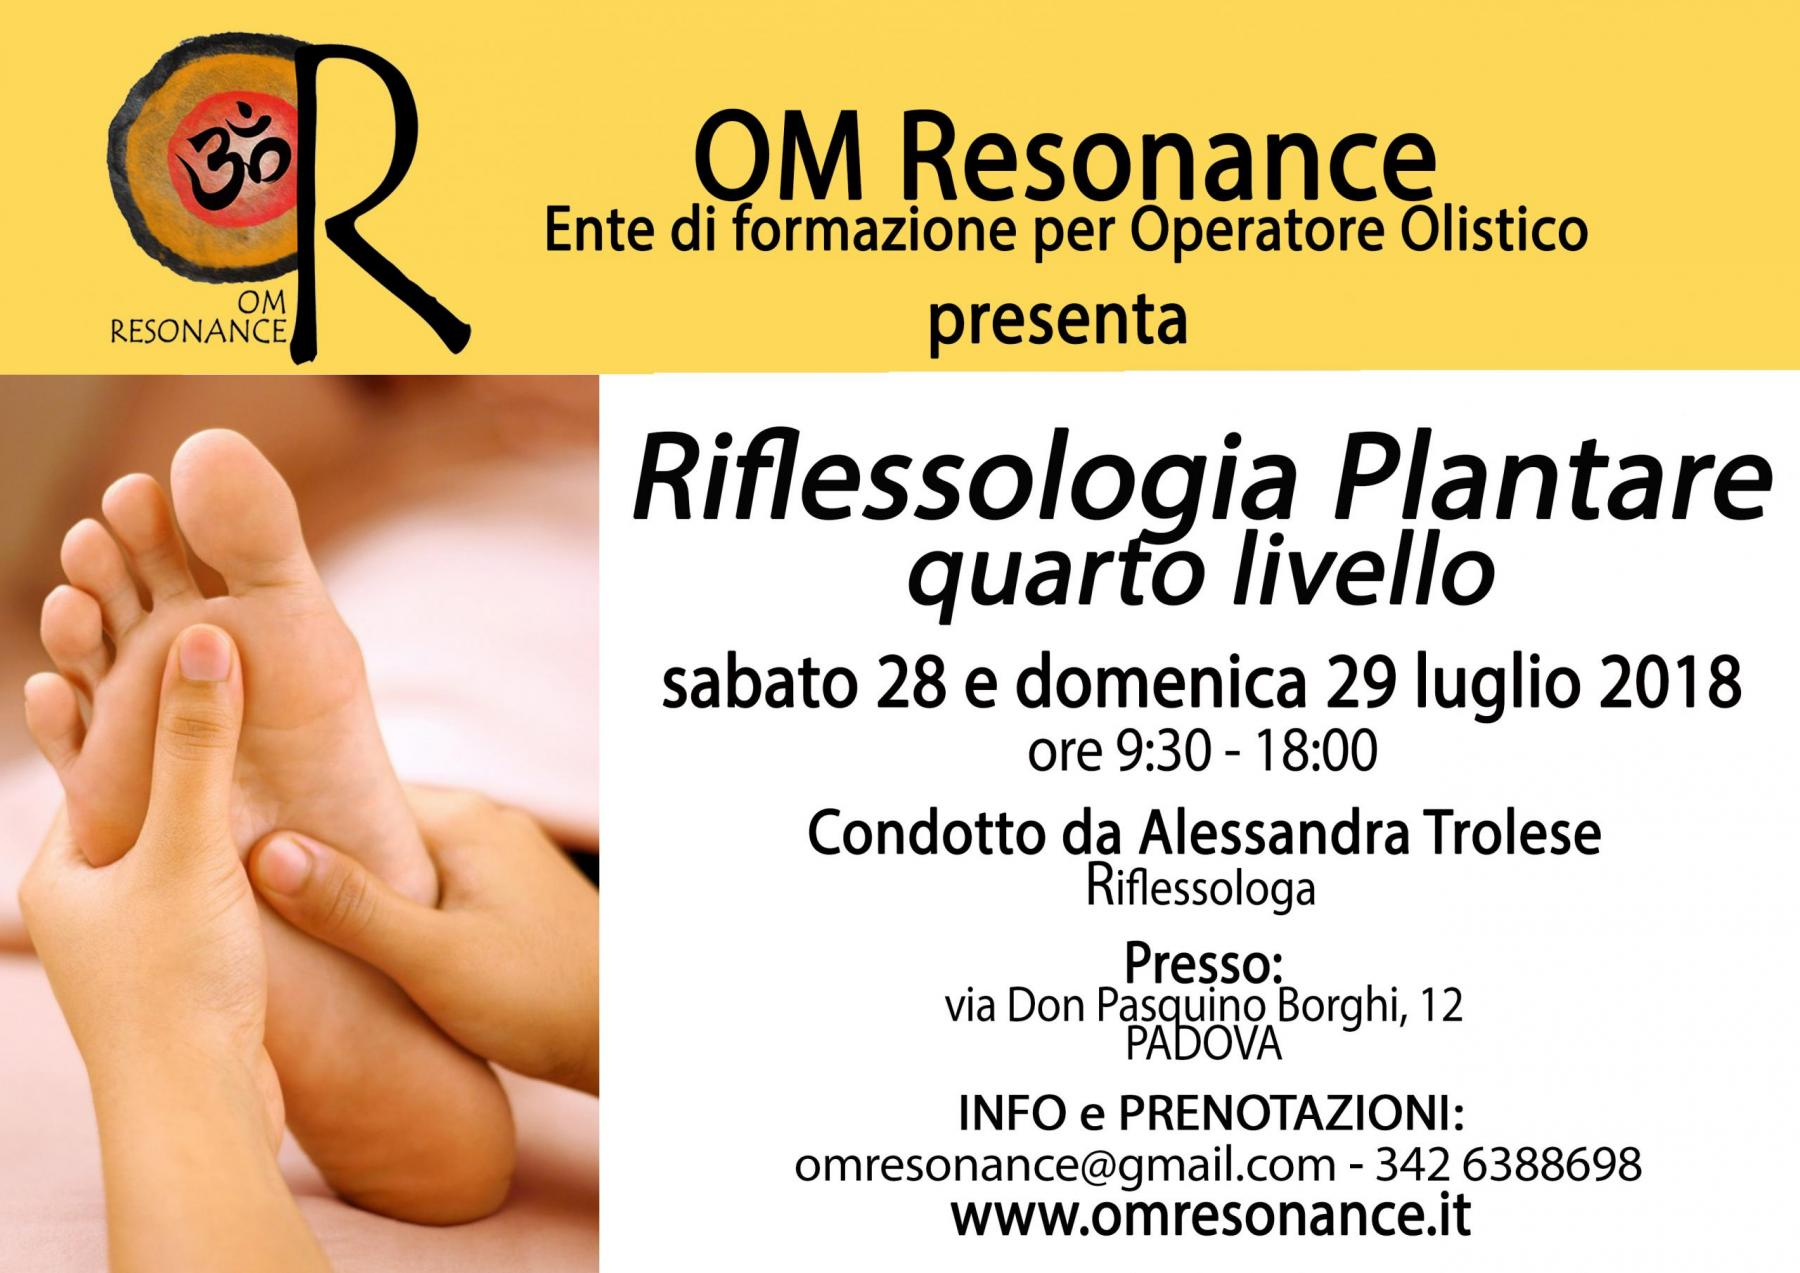 Riflessologia Plantare 4 livello Padova OM Resonance